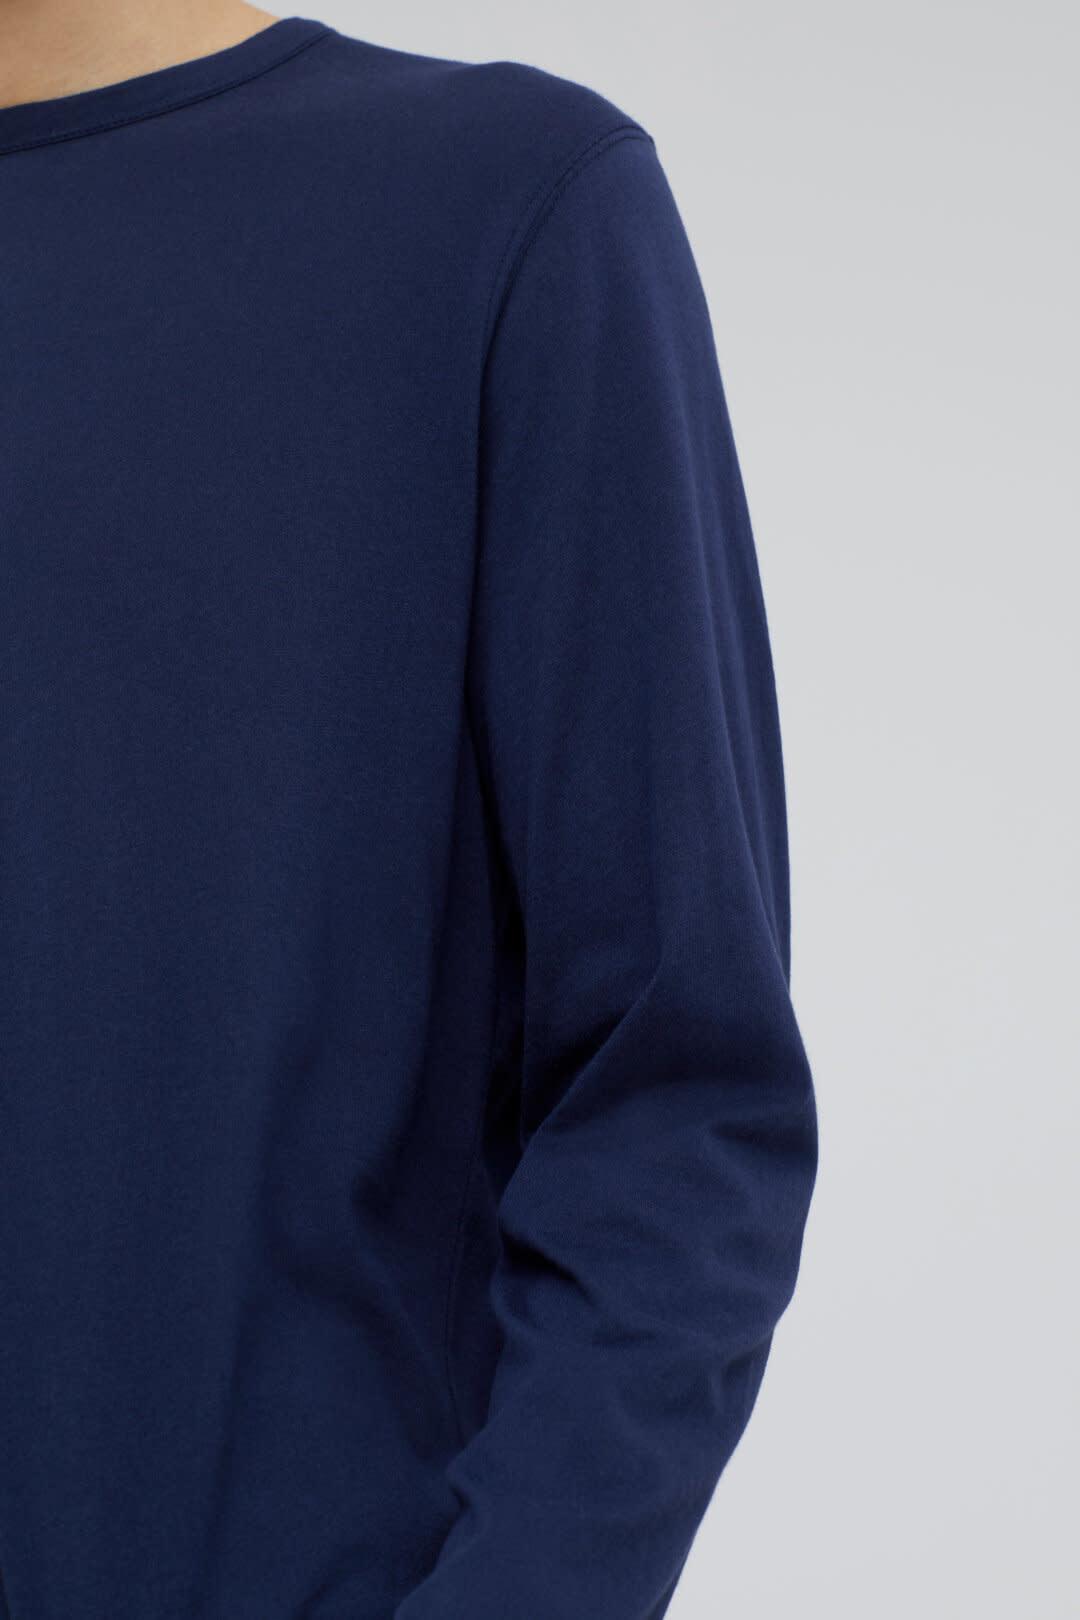 Cotton cashmere longsleeve dark night-4